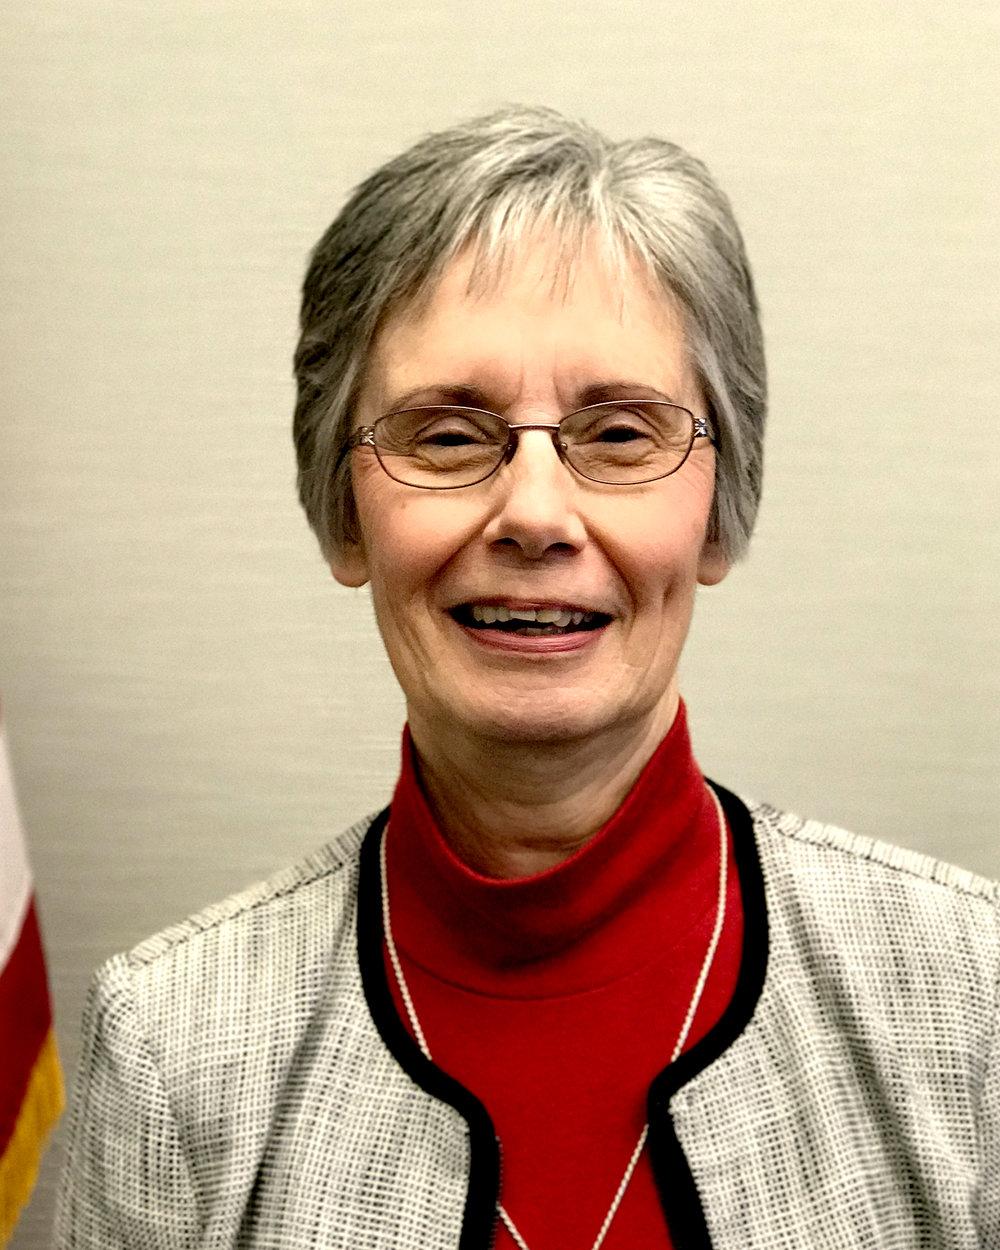 Patricia Wolfe Elections Administrator (614) 466-2585  pwolfe@ohiosecretaryofstate.gov   Website